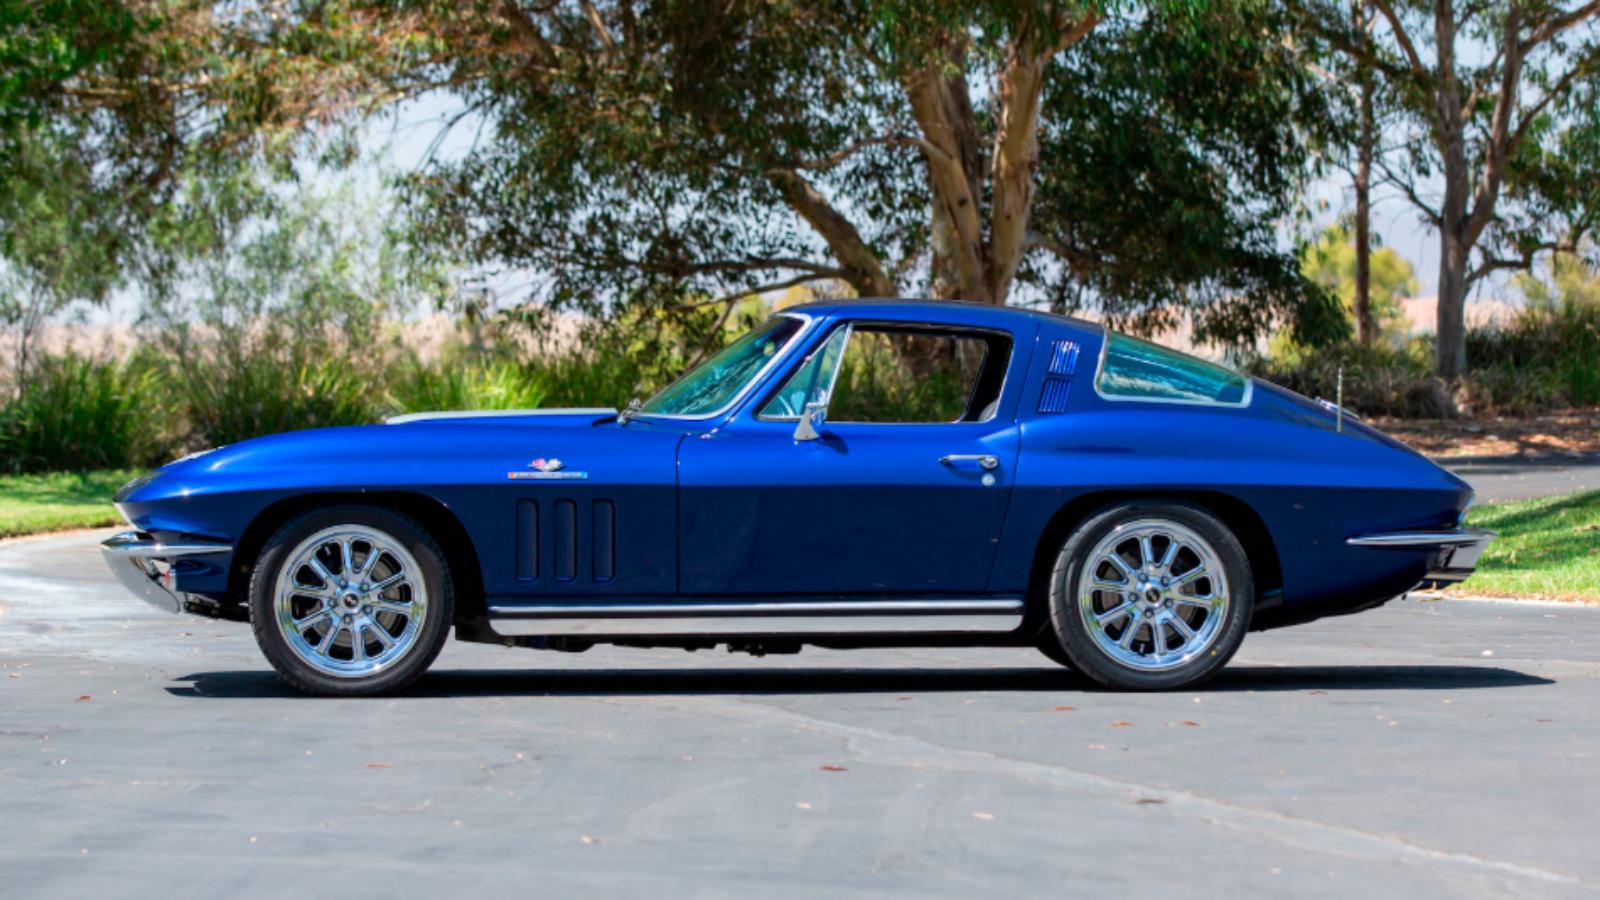 1965 Corvette Restomod is Perfectly Tasteful | Corvetteforum